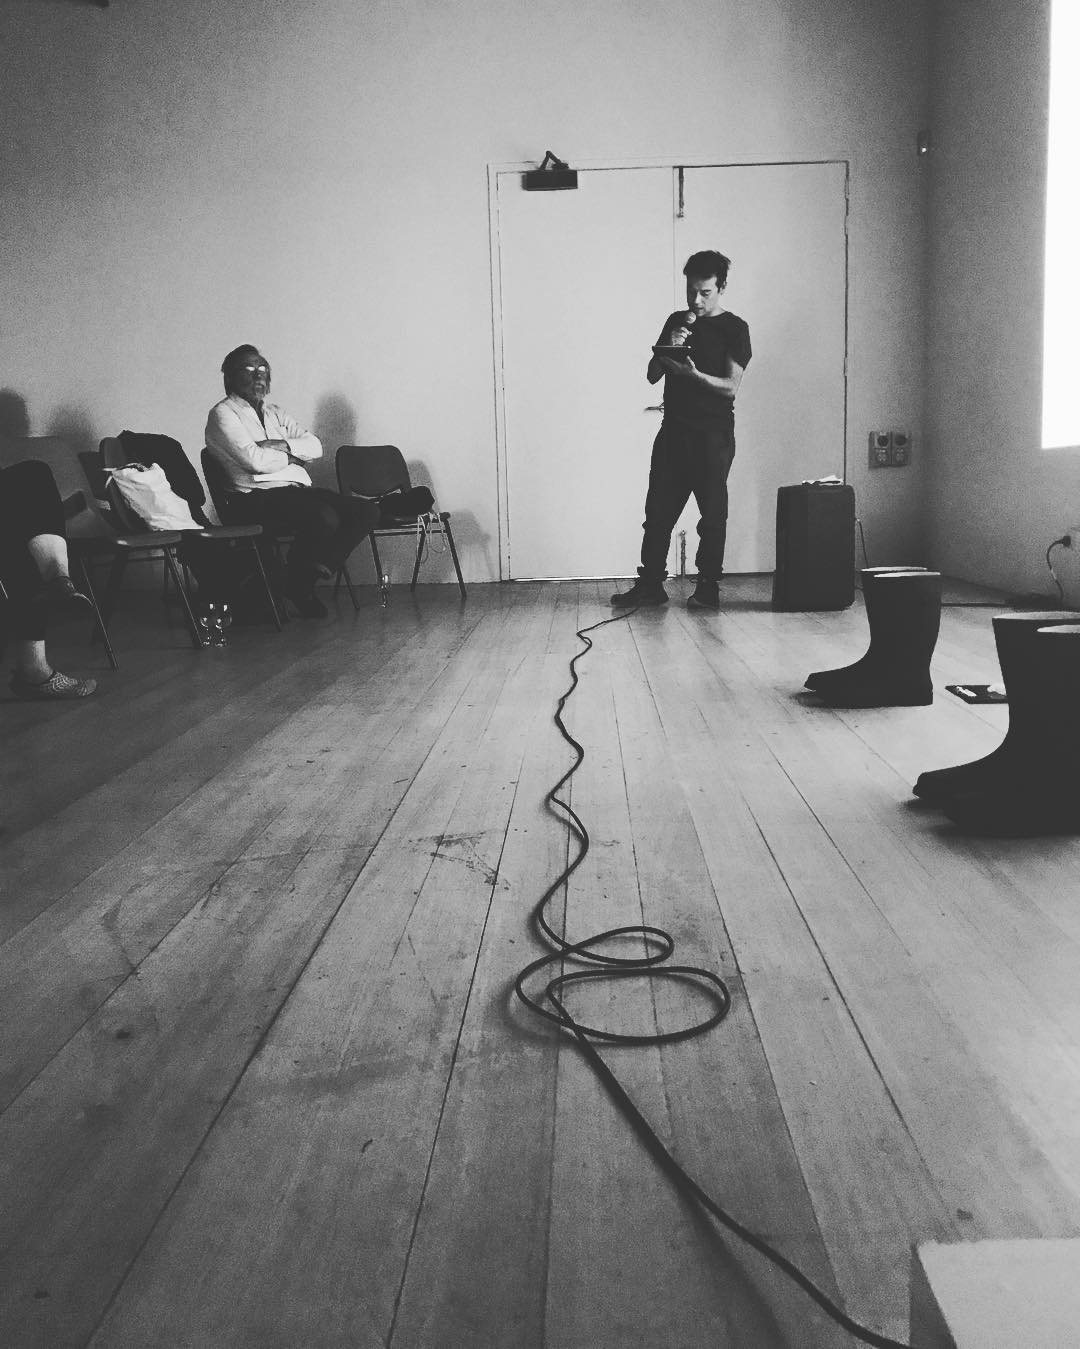 Eduardo Cruces, Contemporary Art Symposium, image credit: Philippa Stafford (2018)